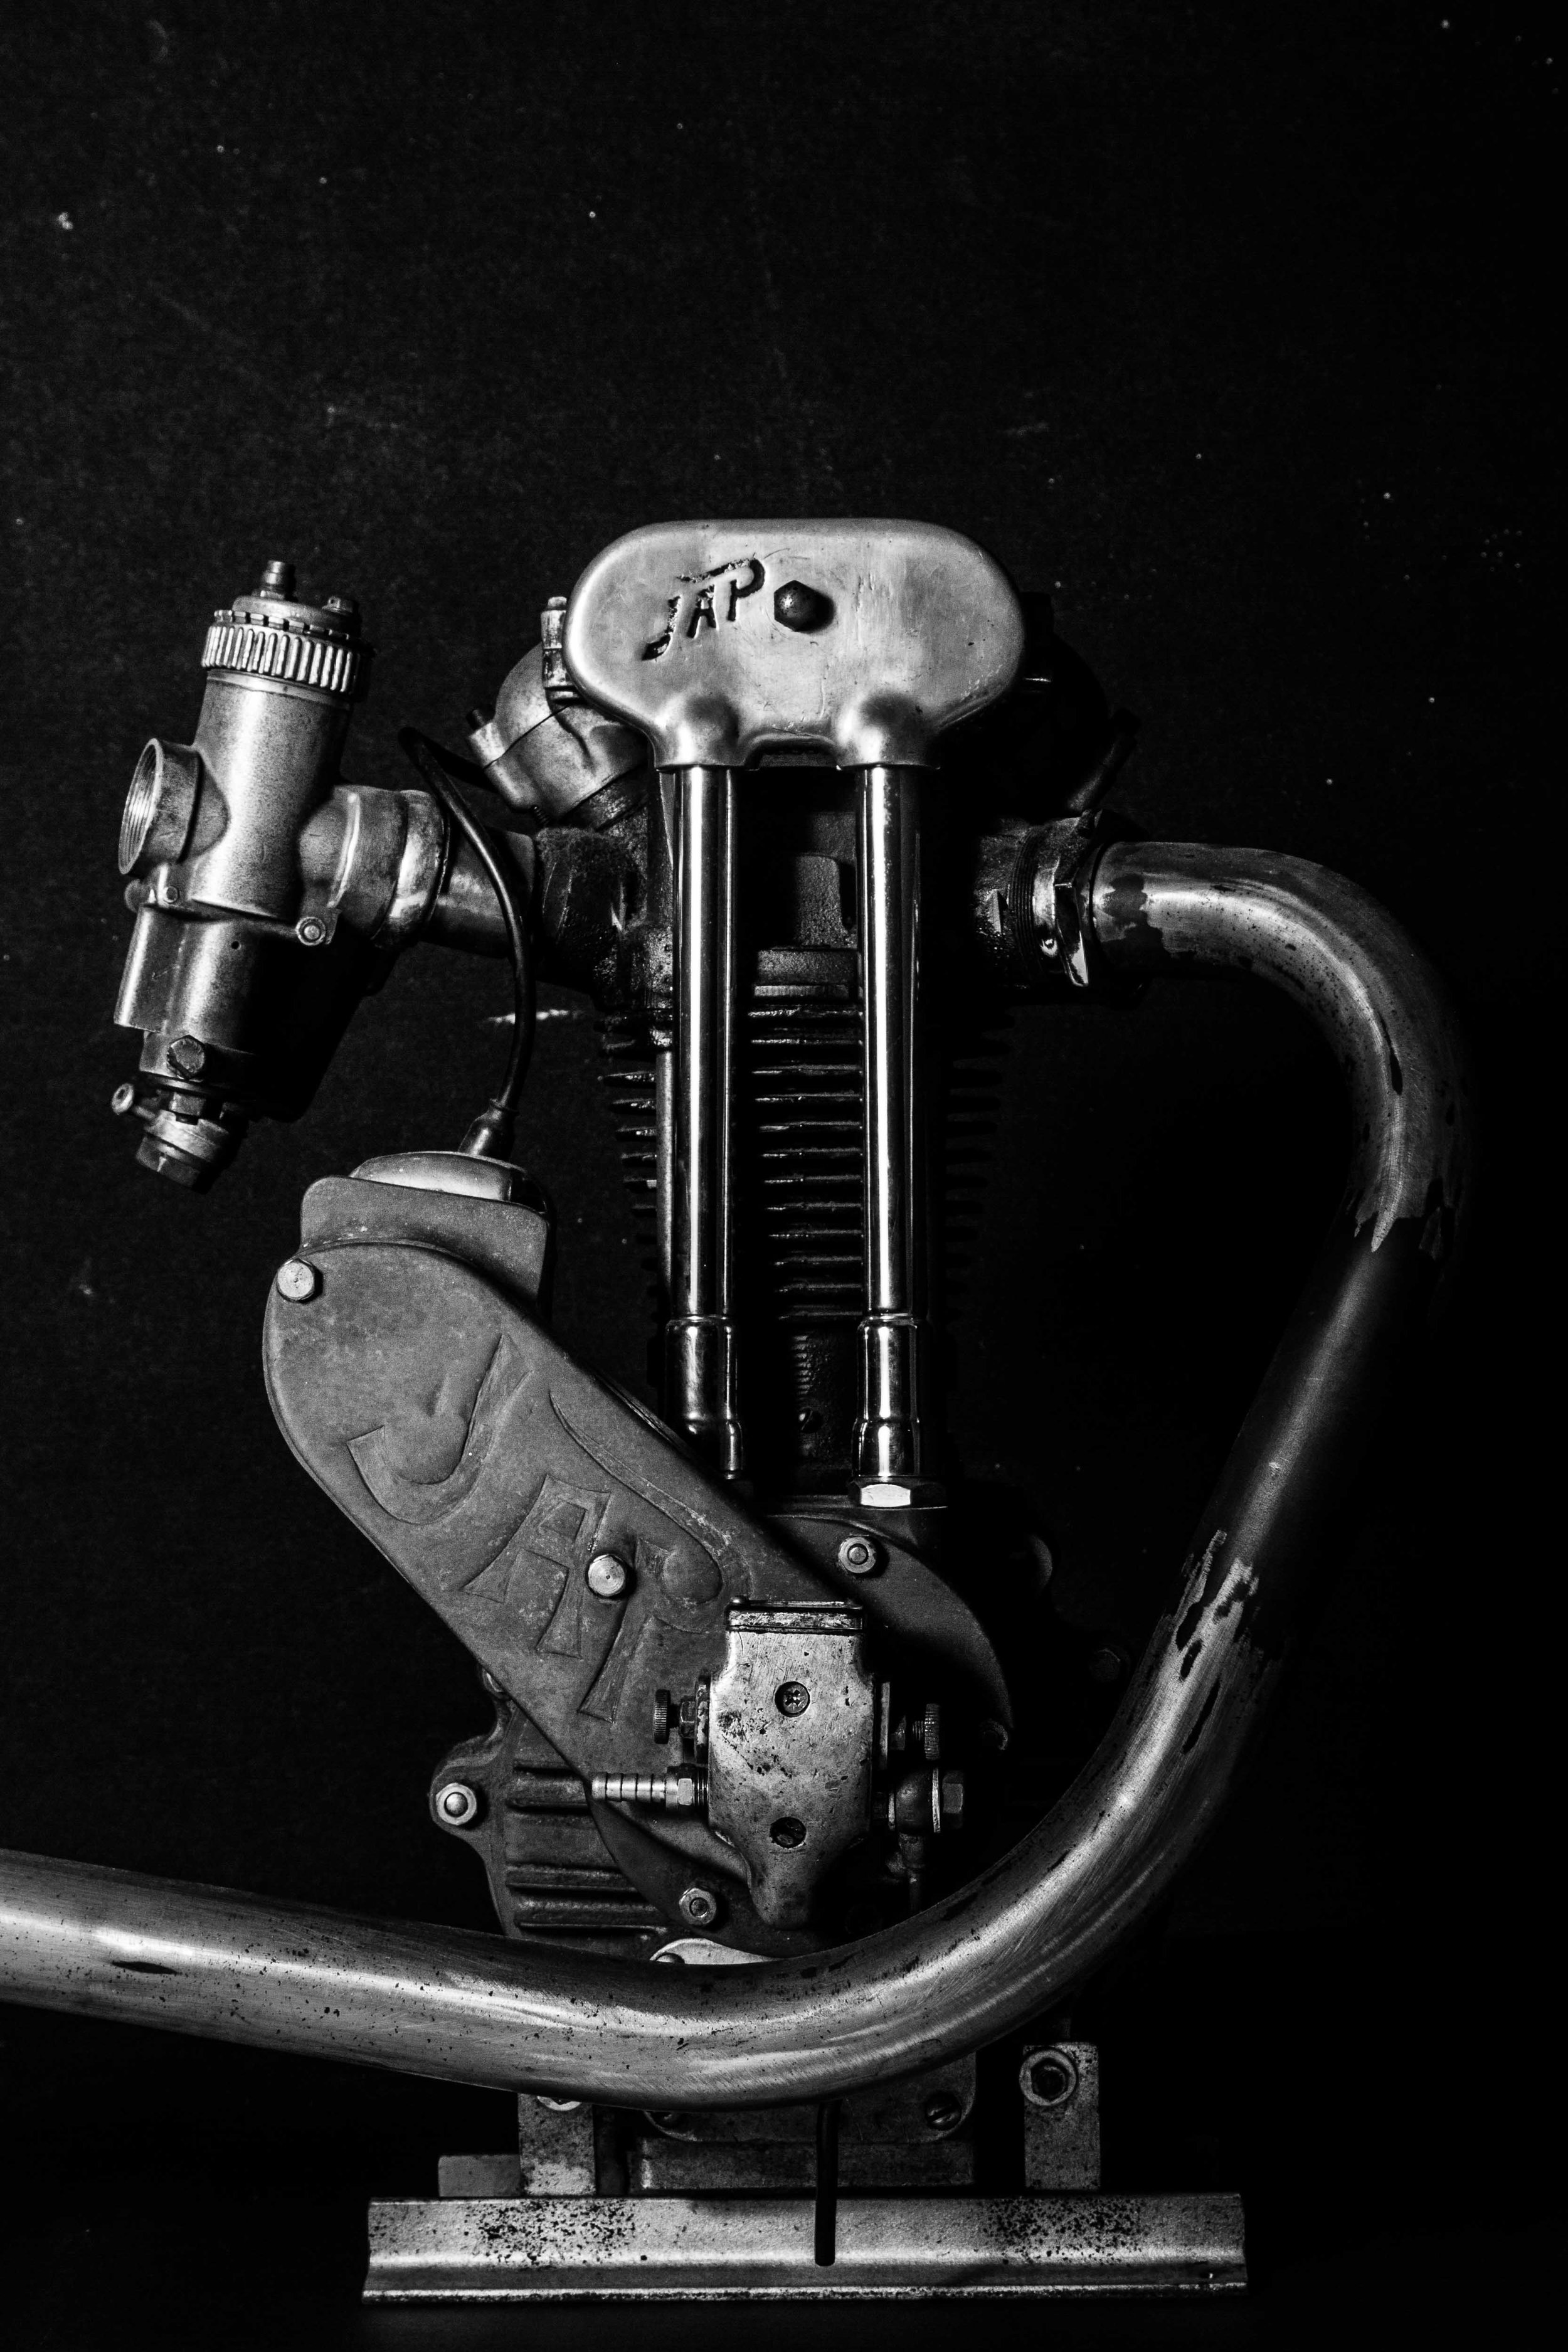 JAP motor.